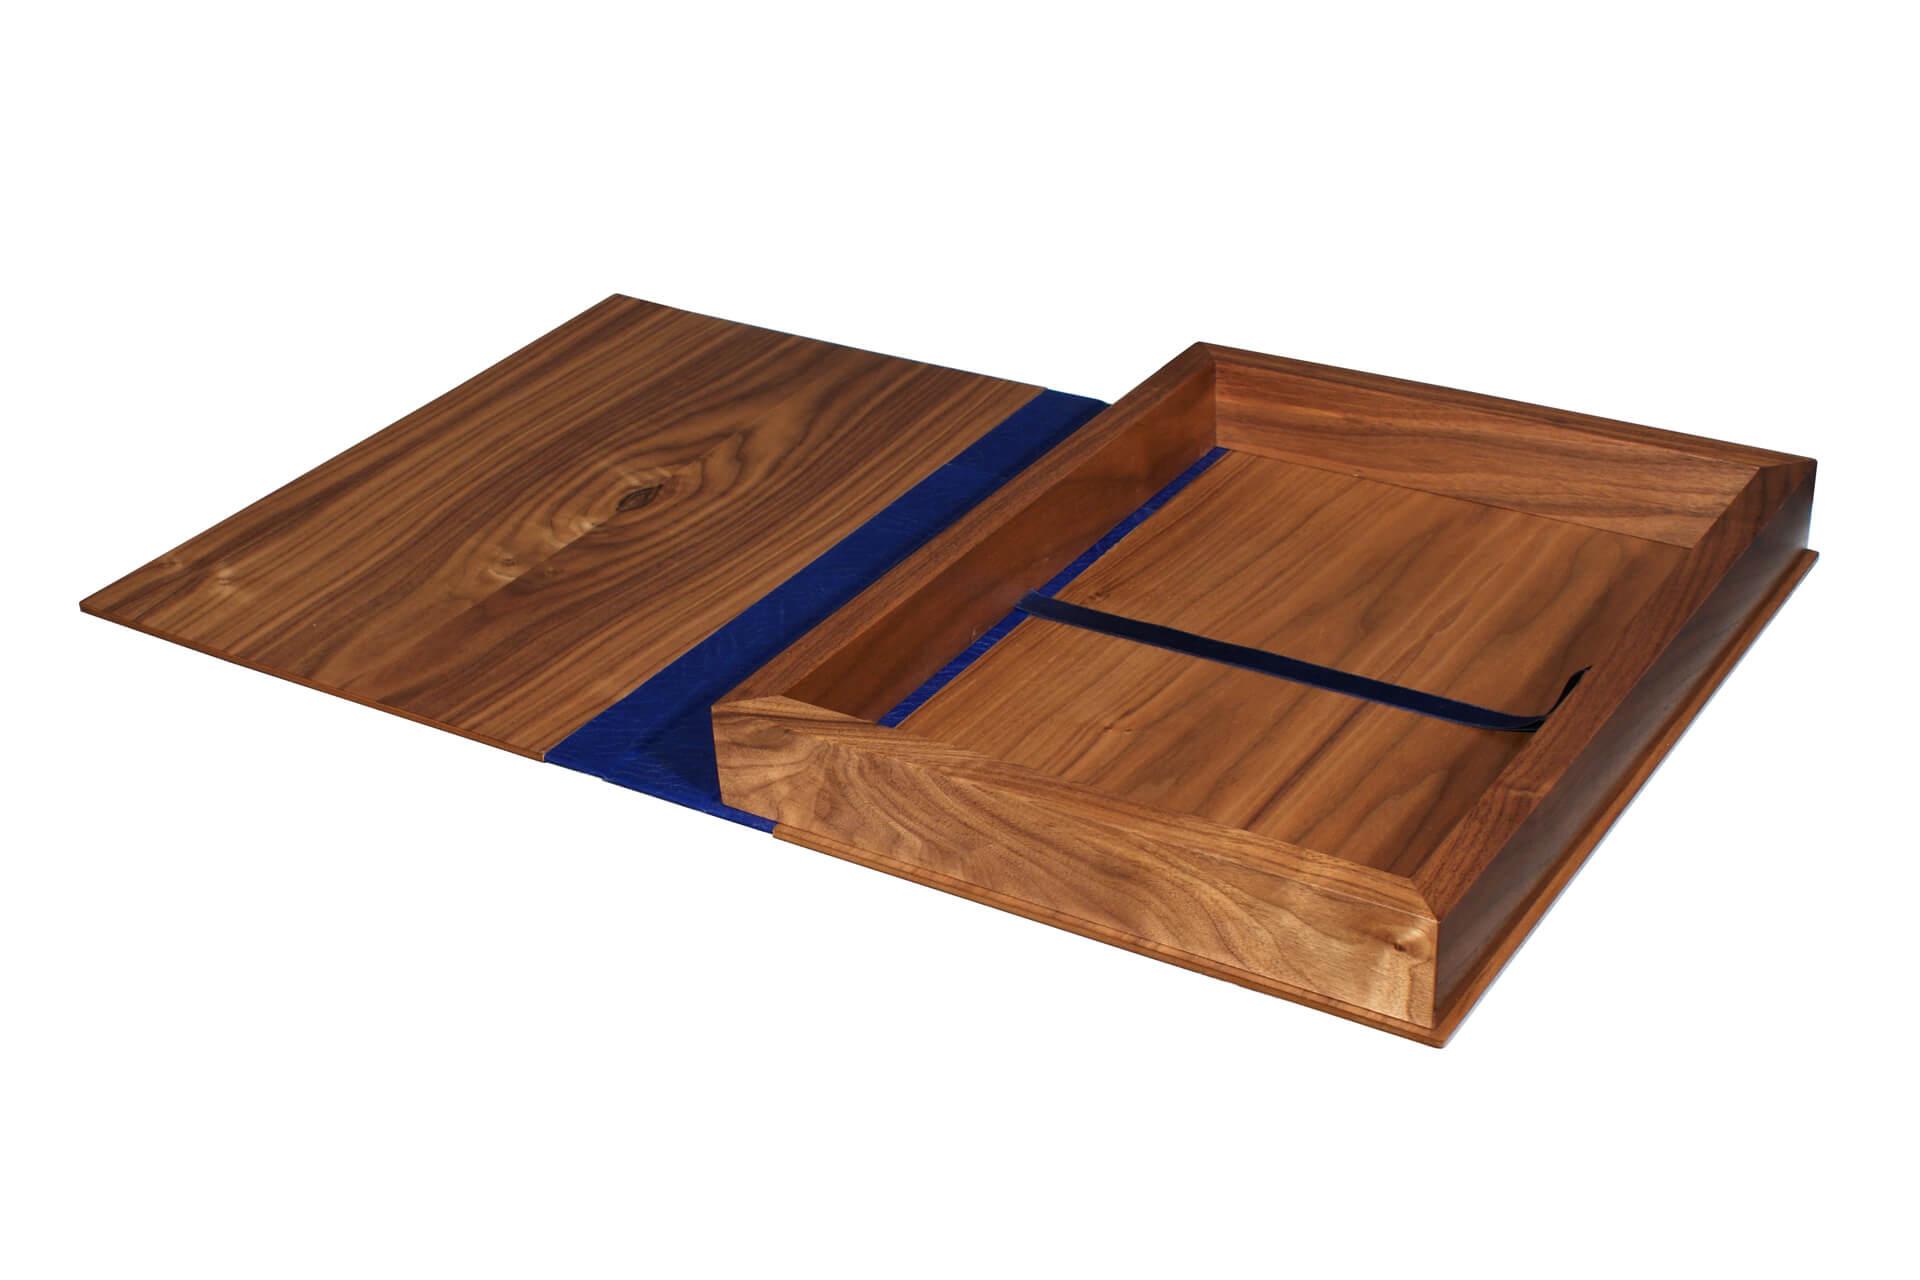 bespoke wooden hotel room folder guest information box